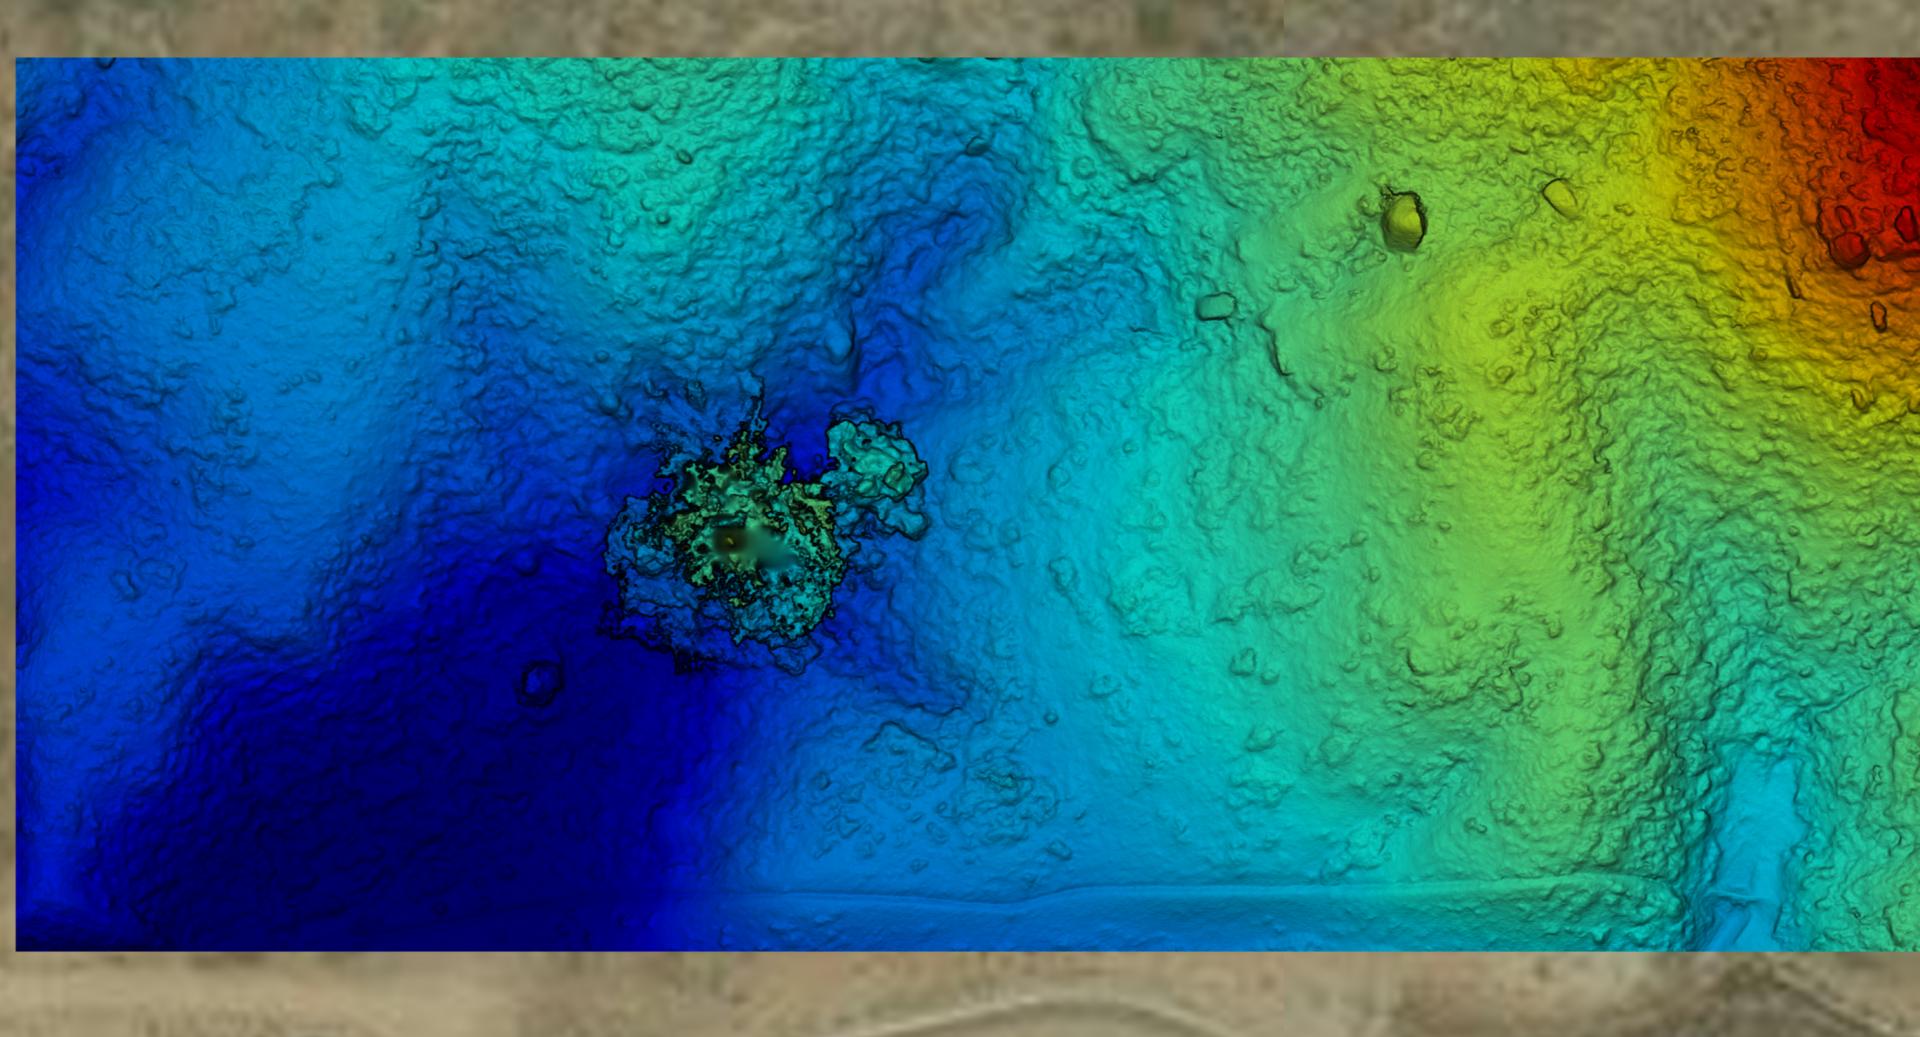 TOPOGRAPHY MAPS ELEVATION SURVEY SURVEYING